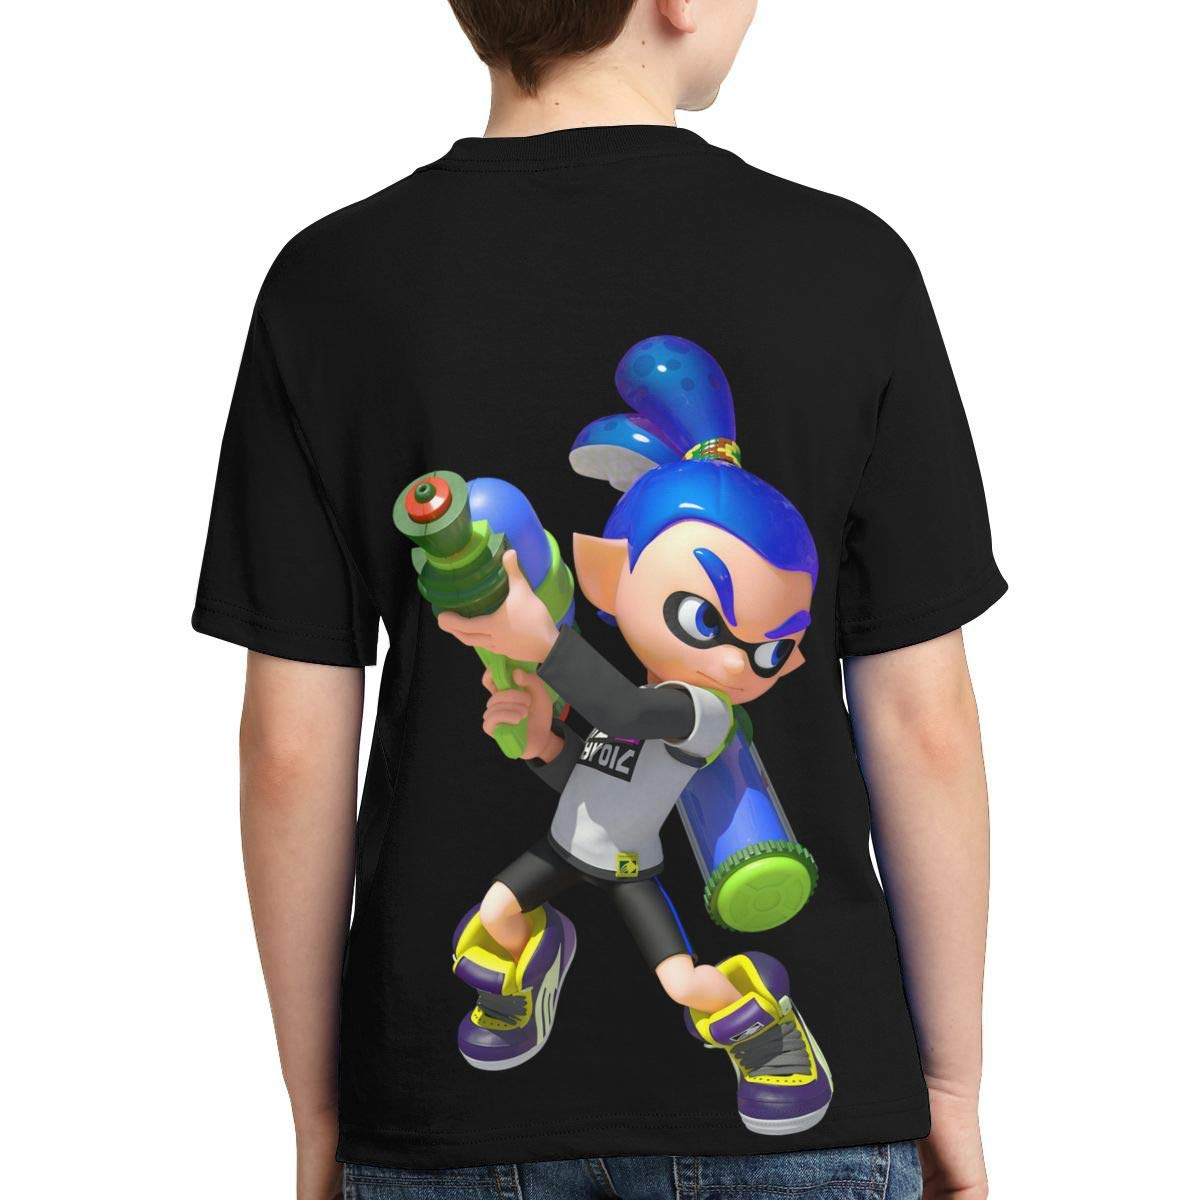 Hatstng Splatoon 2 Boys Girls 3D Print Crew Tee Youth Short Sleeve T-Shirt Tanks Tops